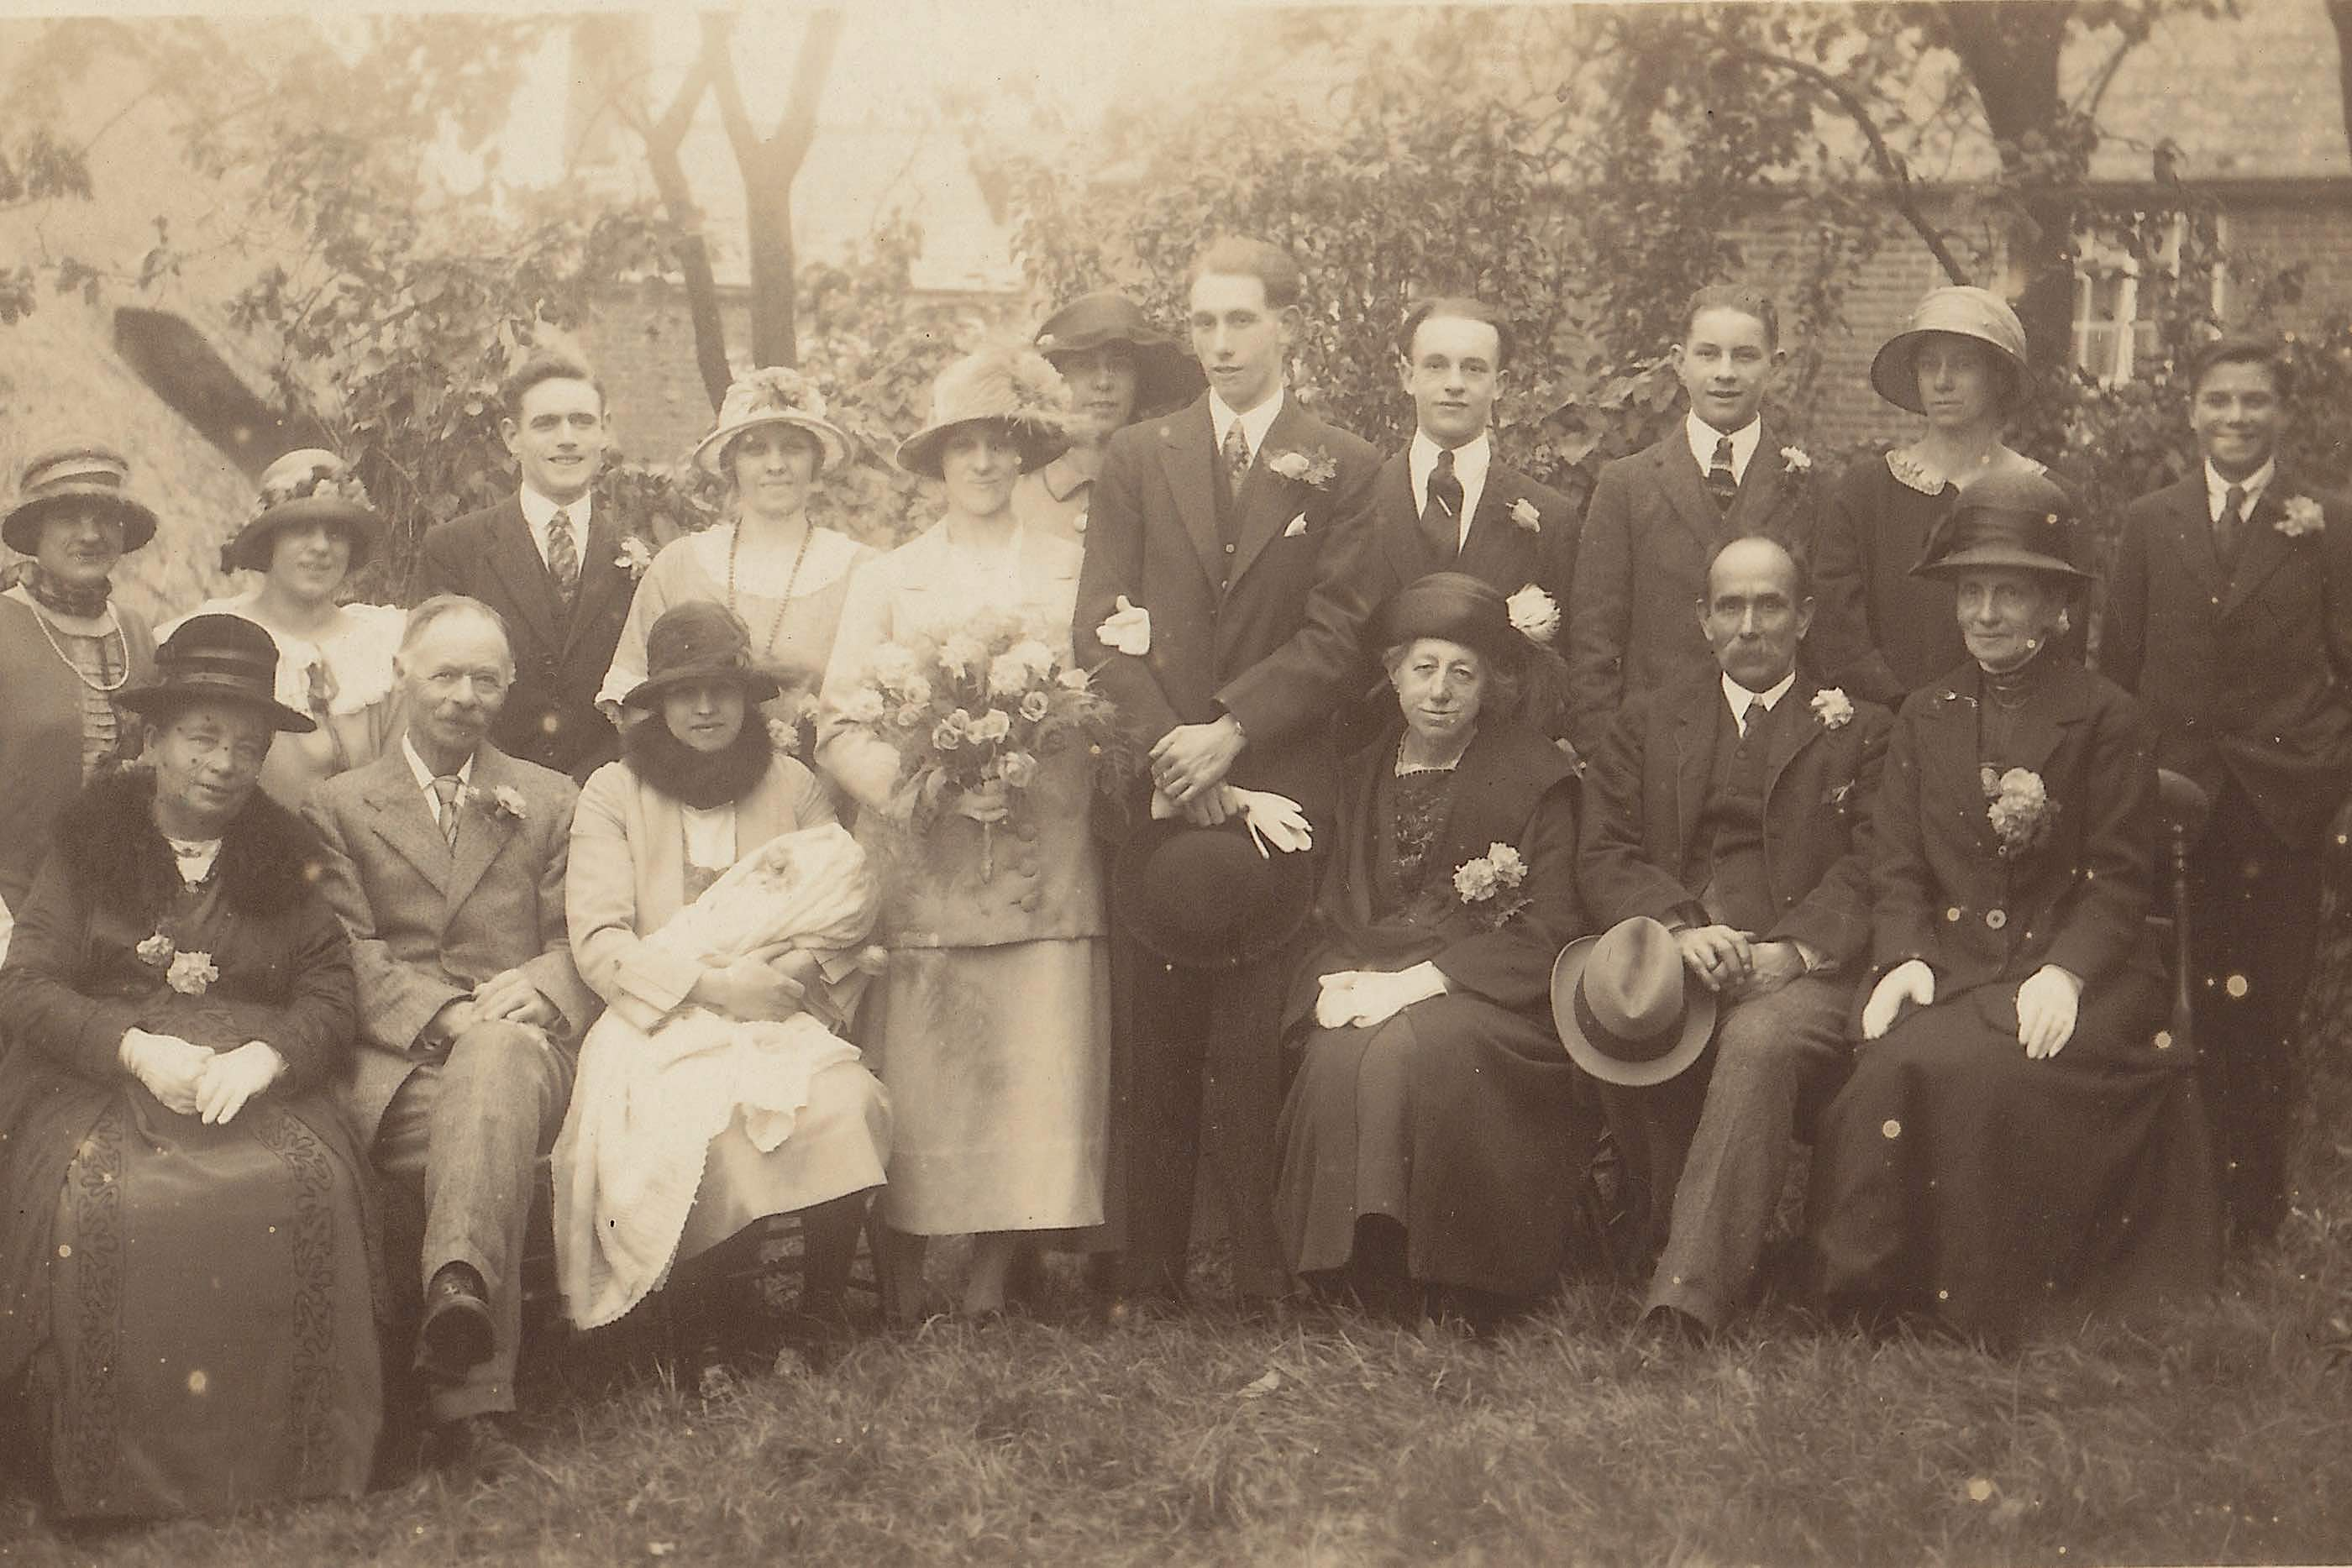 1925 wedding